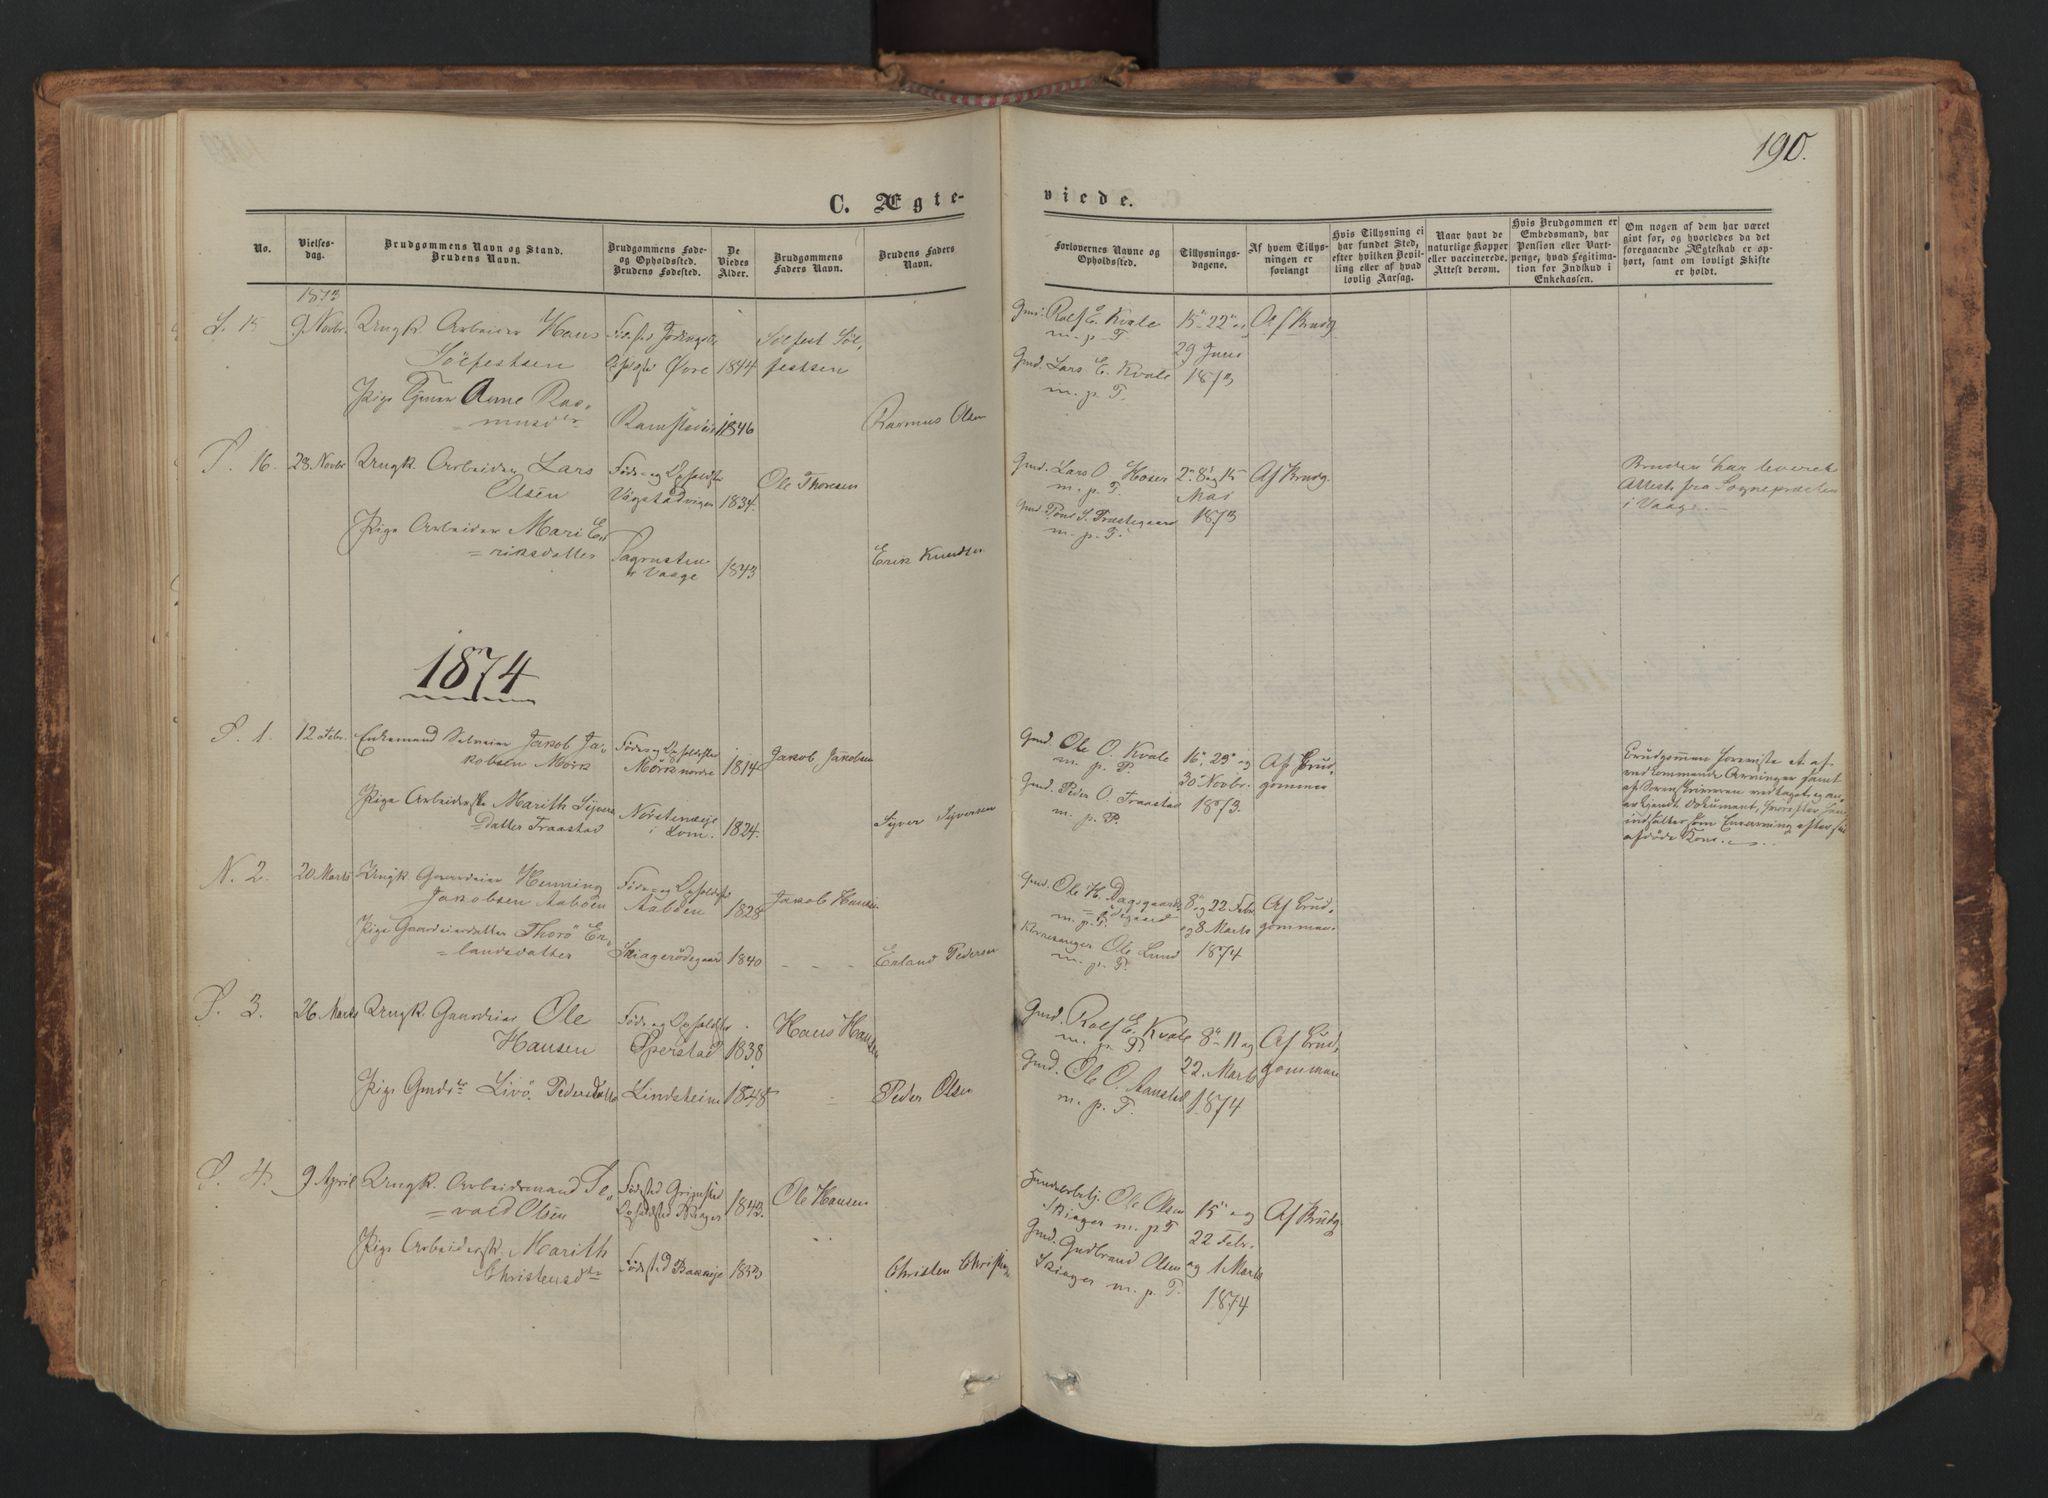 SAH, Skjåk prestekontor, Ministerialbok nr. 1, 1863-1879, s. 190